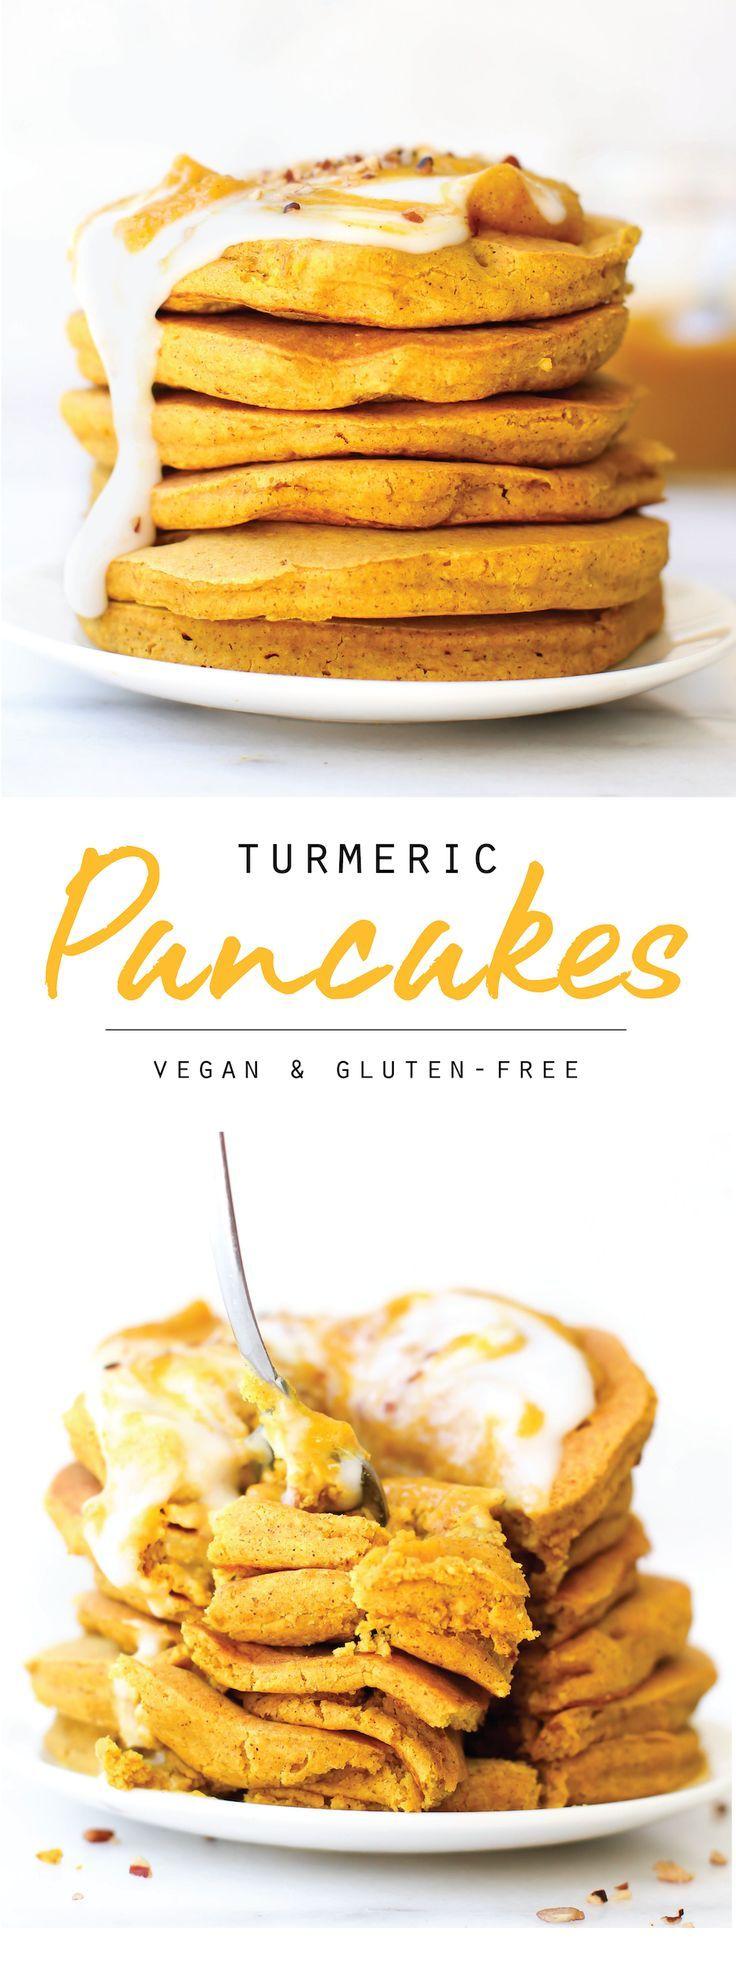 Turmeric Spice Pancakes {vegan, gluten-free, no banana}